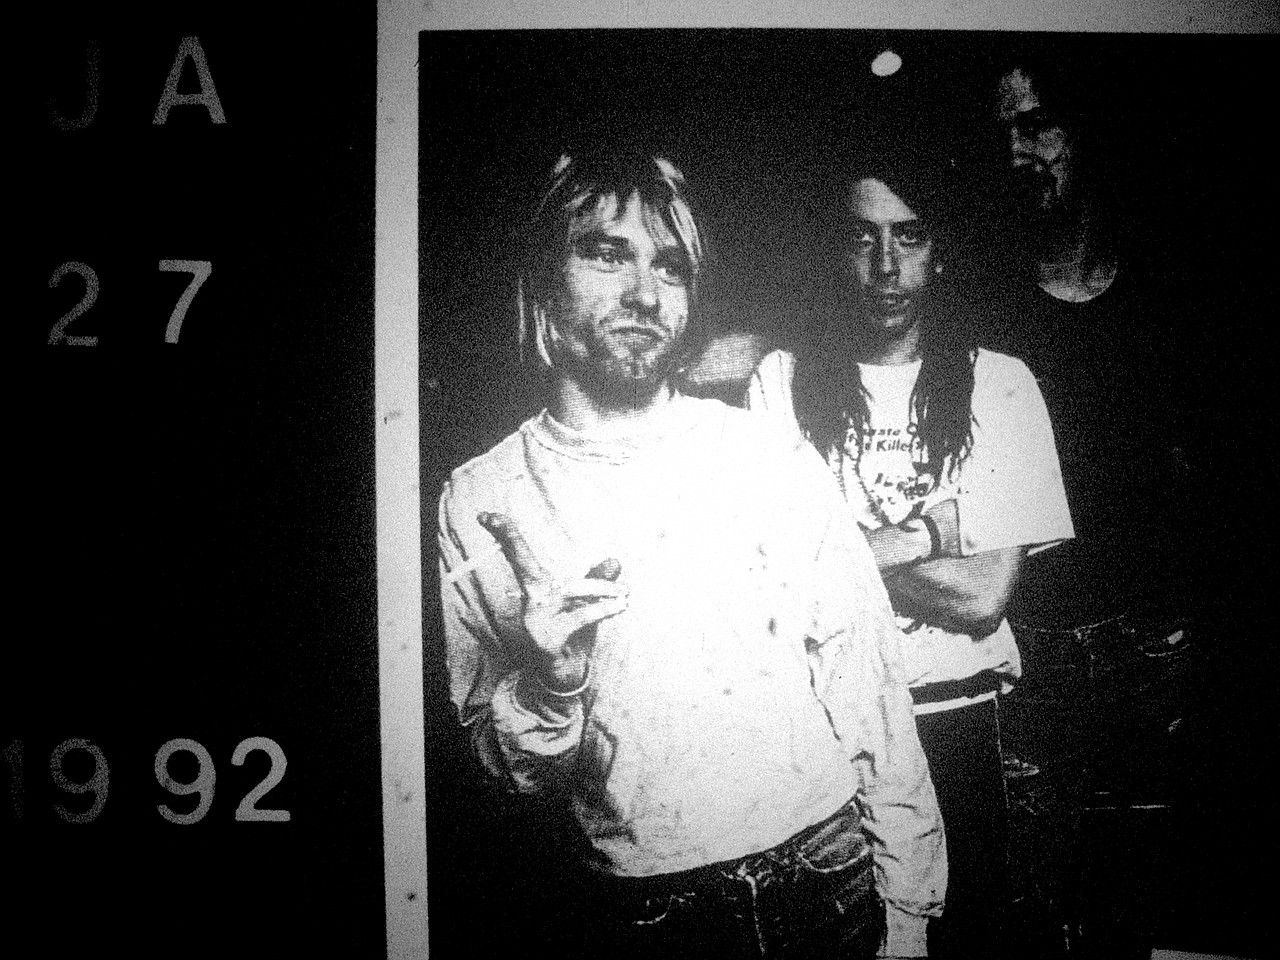 Kurt Cobain, Dave Grohl e Krist Novoselic em 1992 (Foto: Flickr/davetoaster)